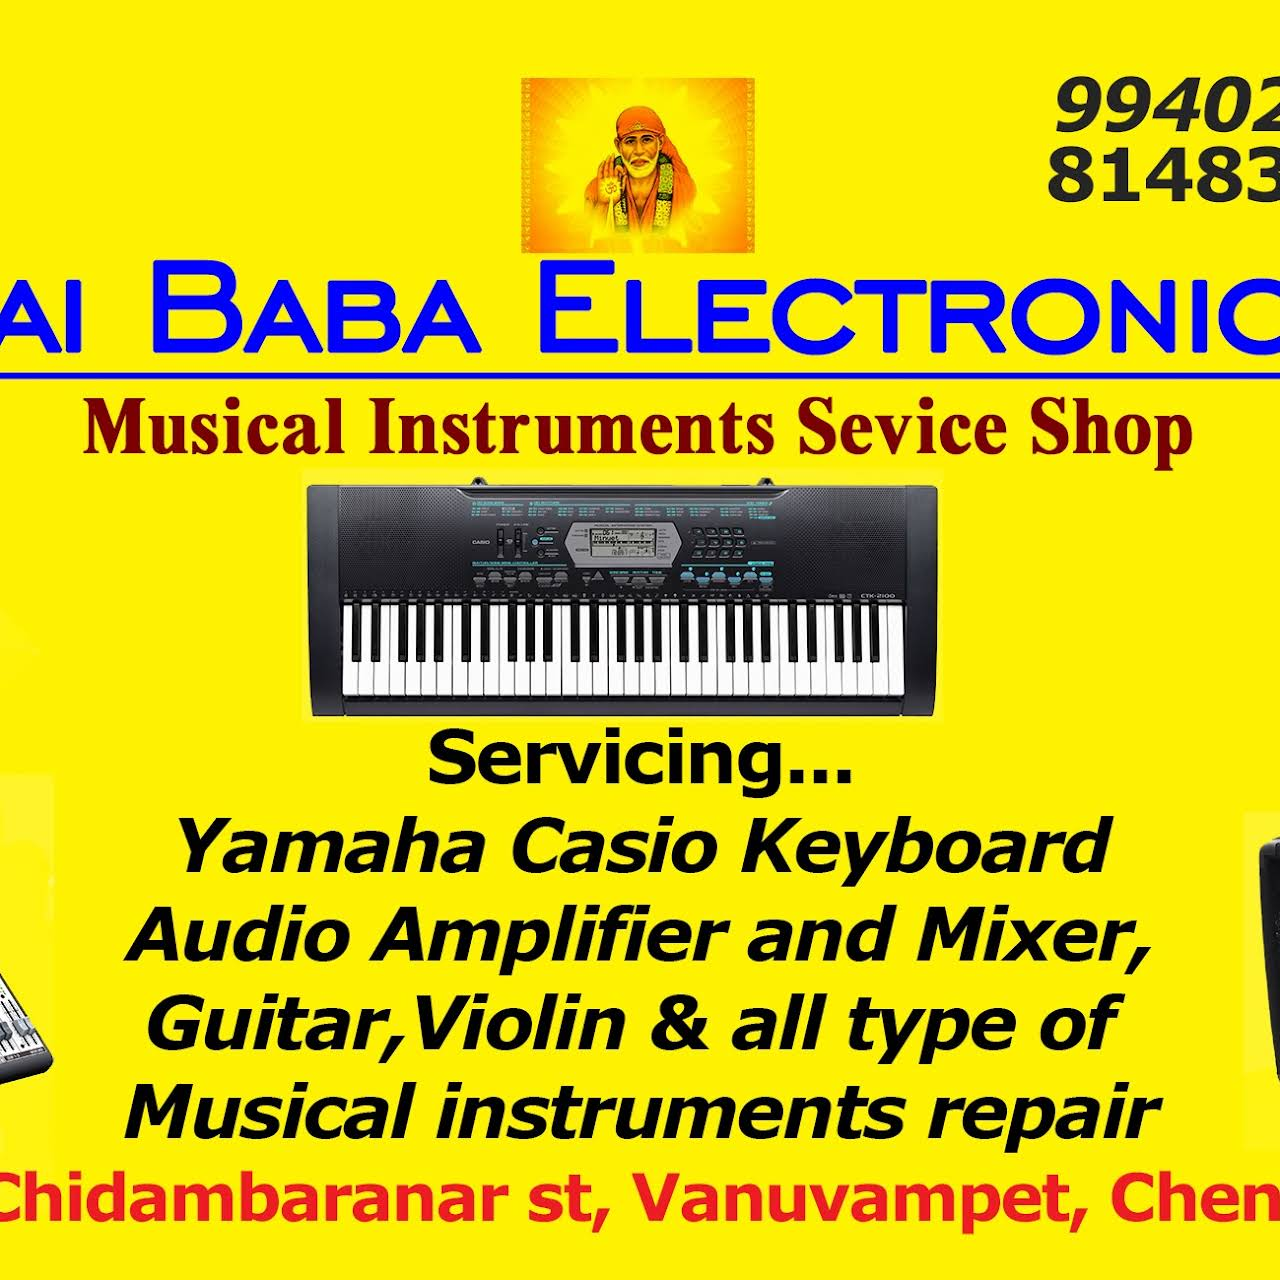 Sri Sai Baba Electronics (musical instruments store service